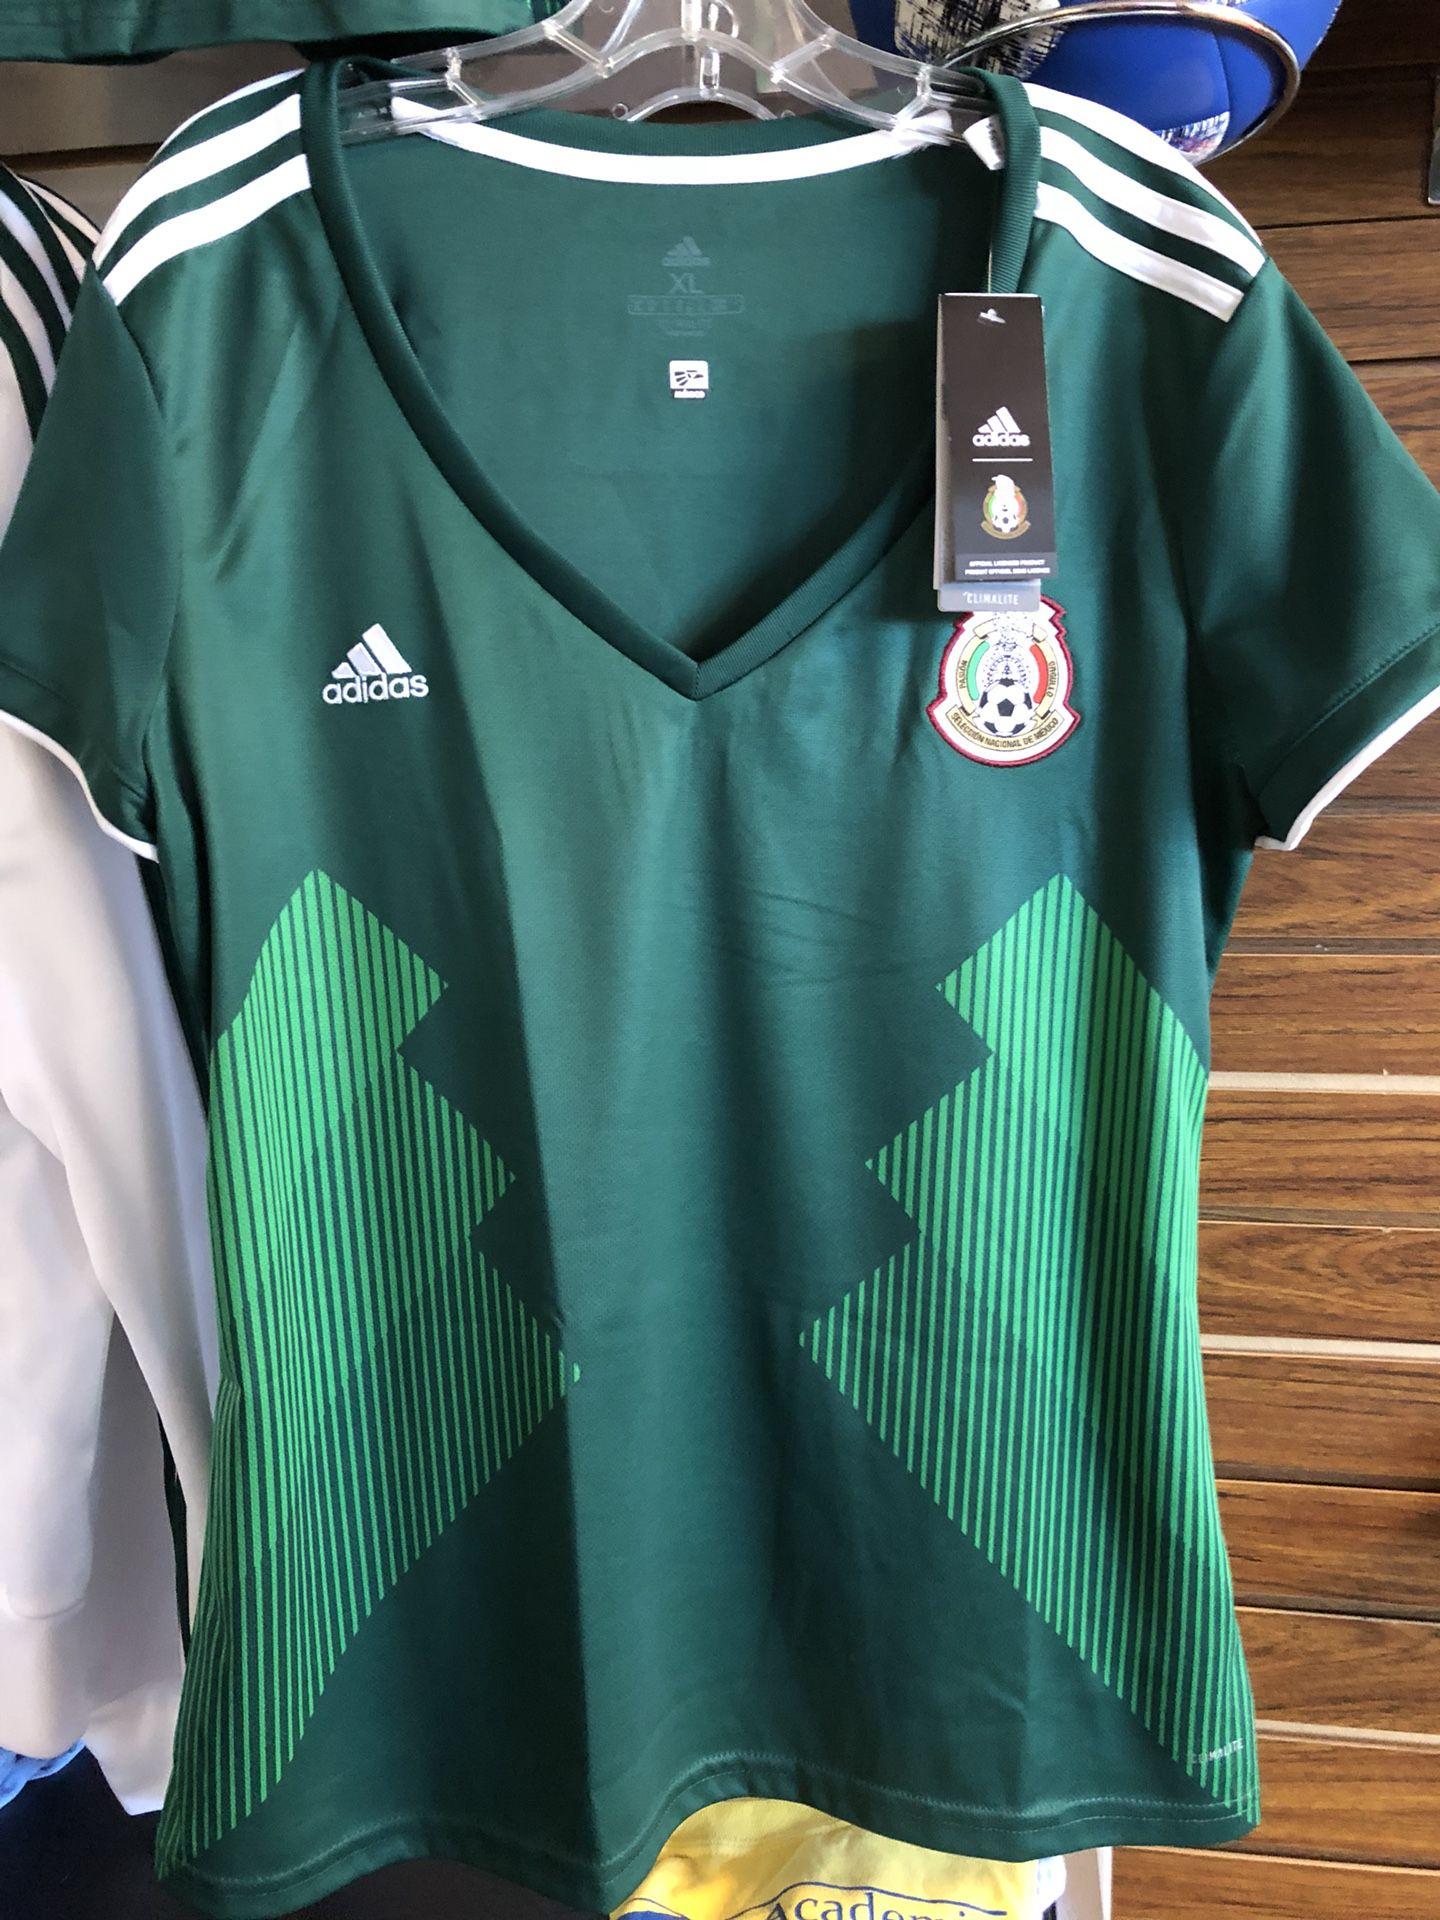 Original Mexico Women's Jersey for Sale in Dallas, TX - OfferUp